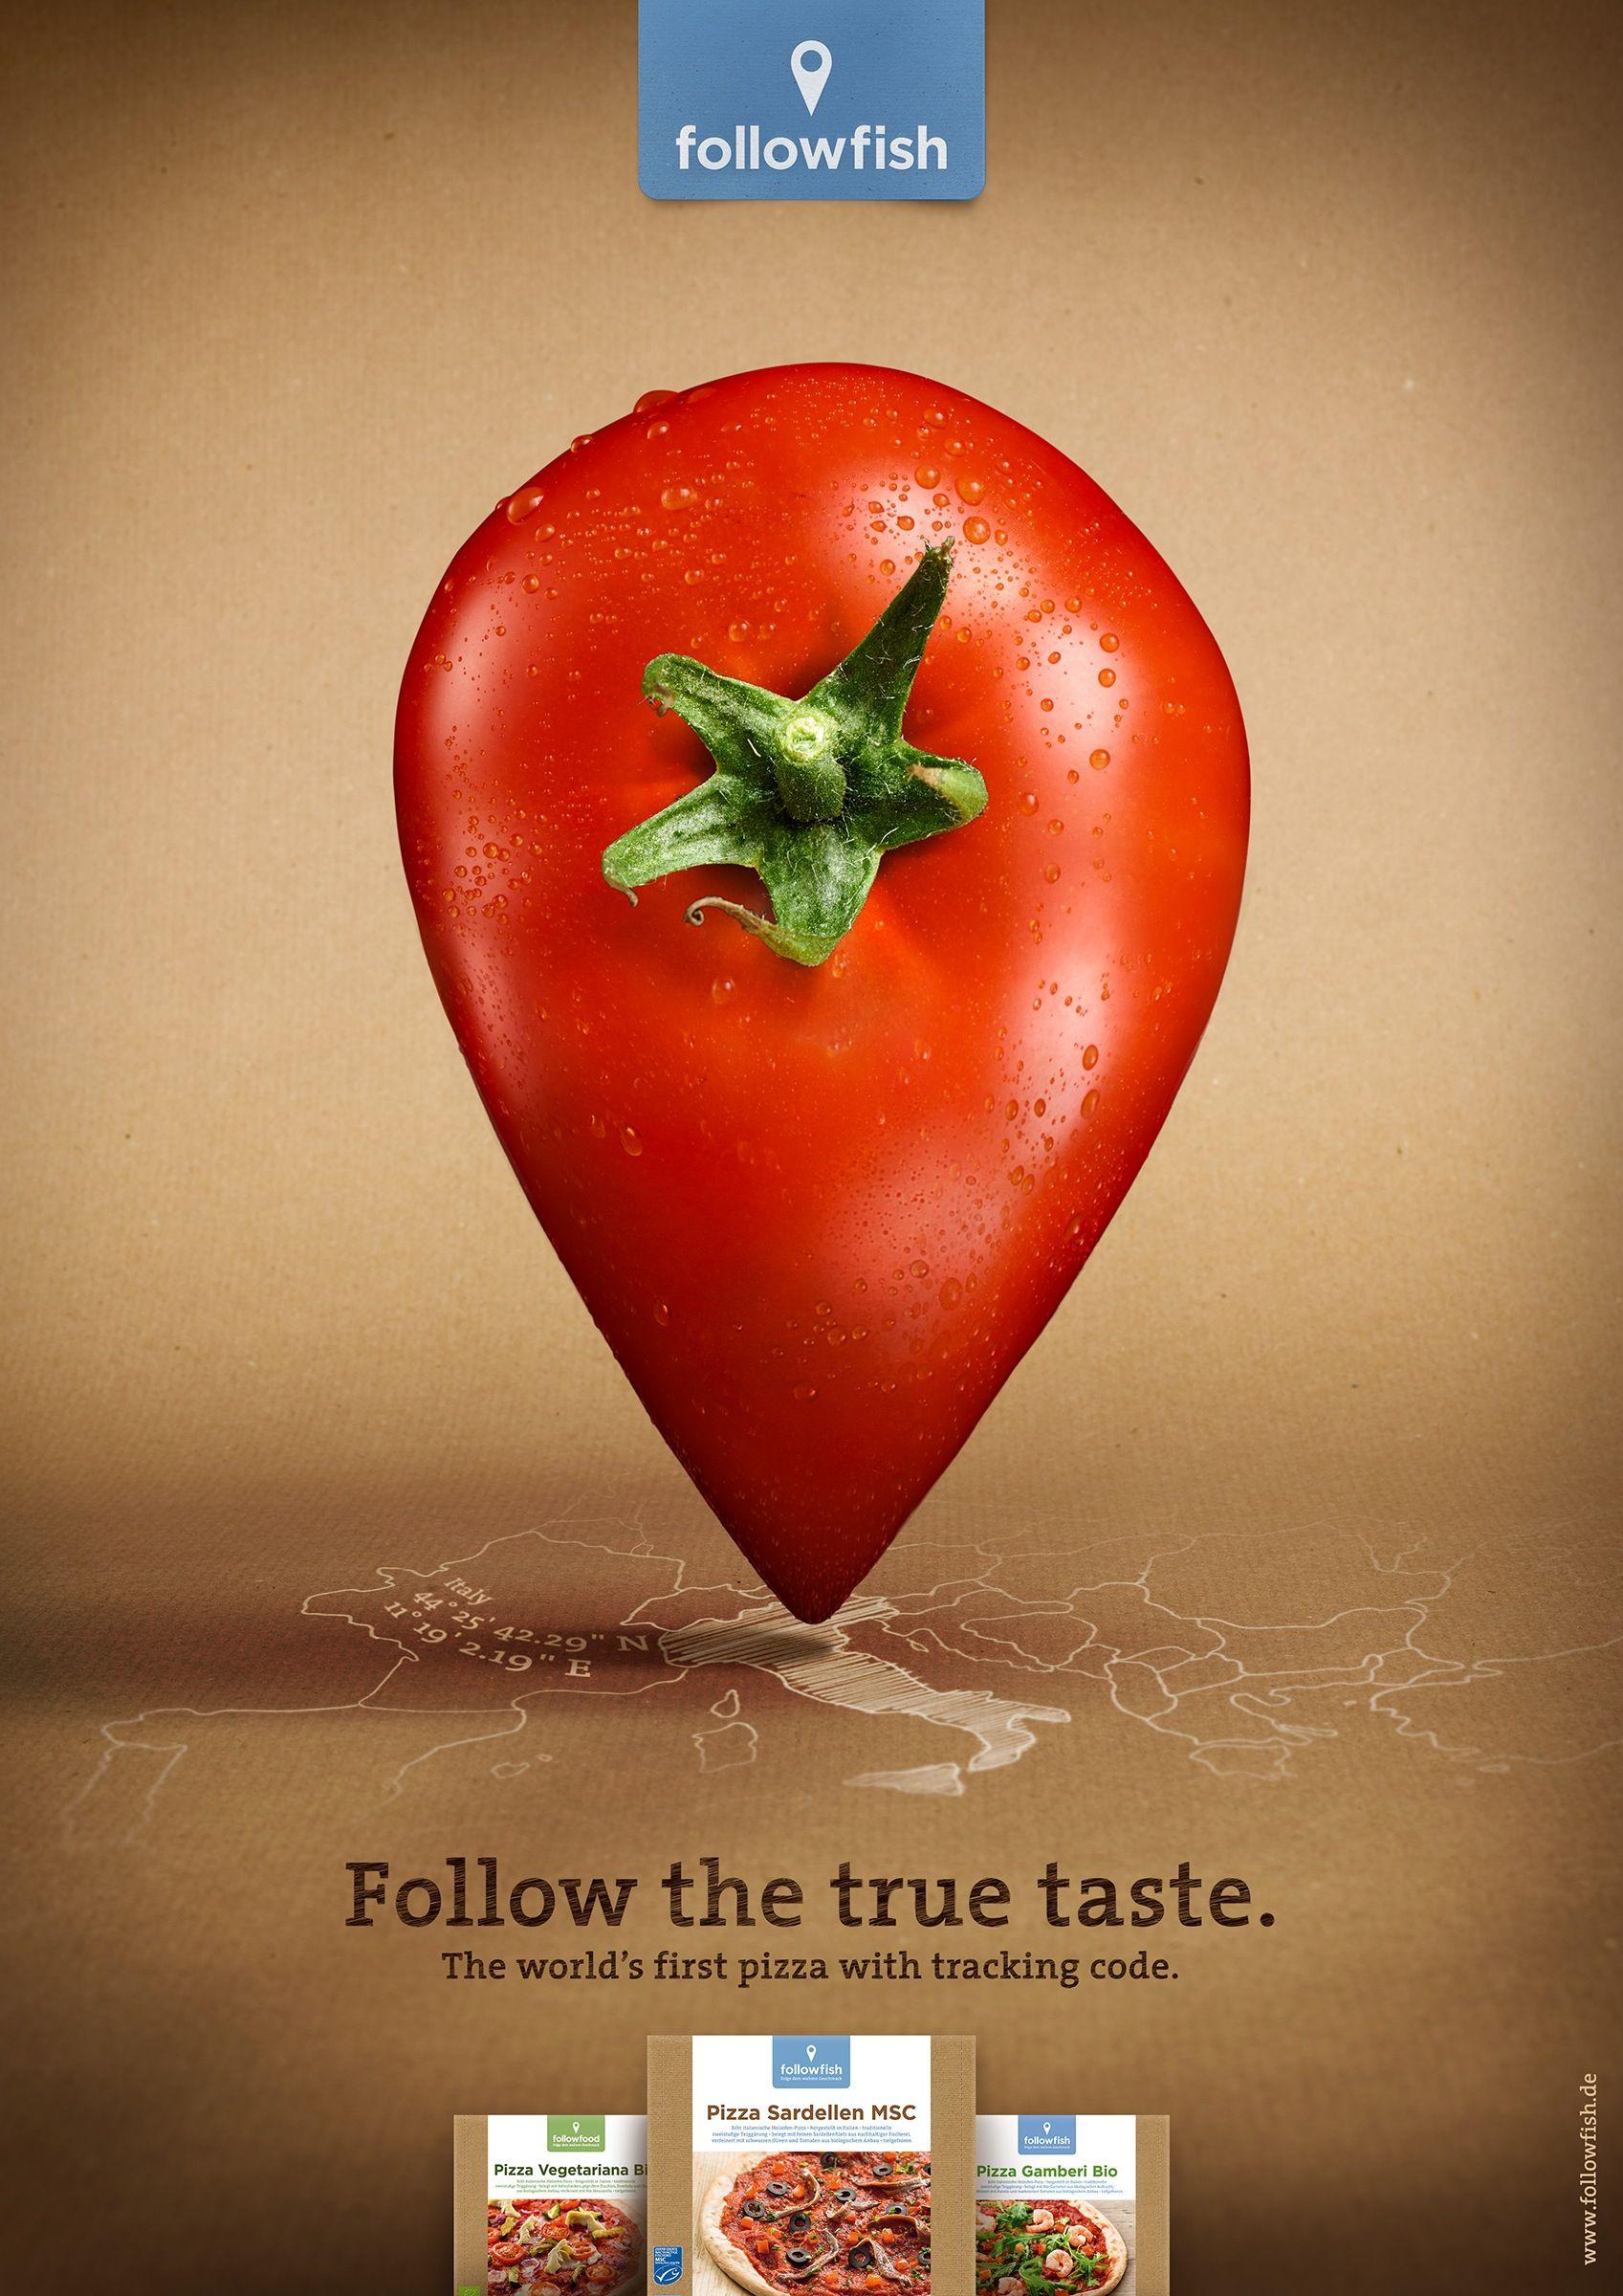 Follow The True Taste Creative Ad Awards クリエイティブな広告